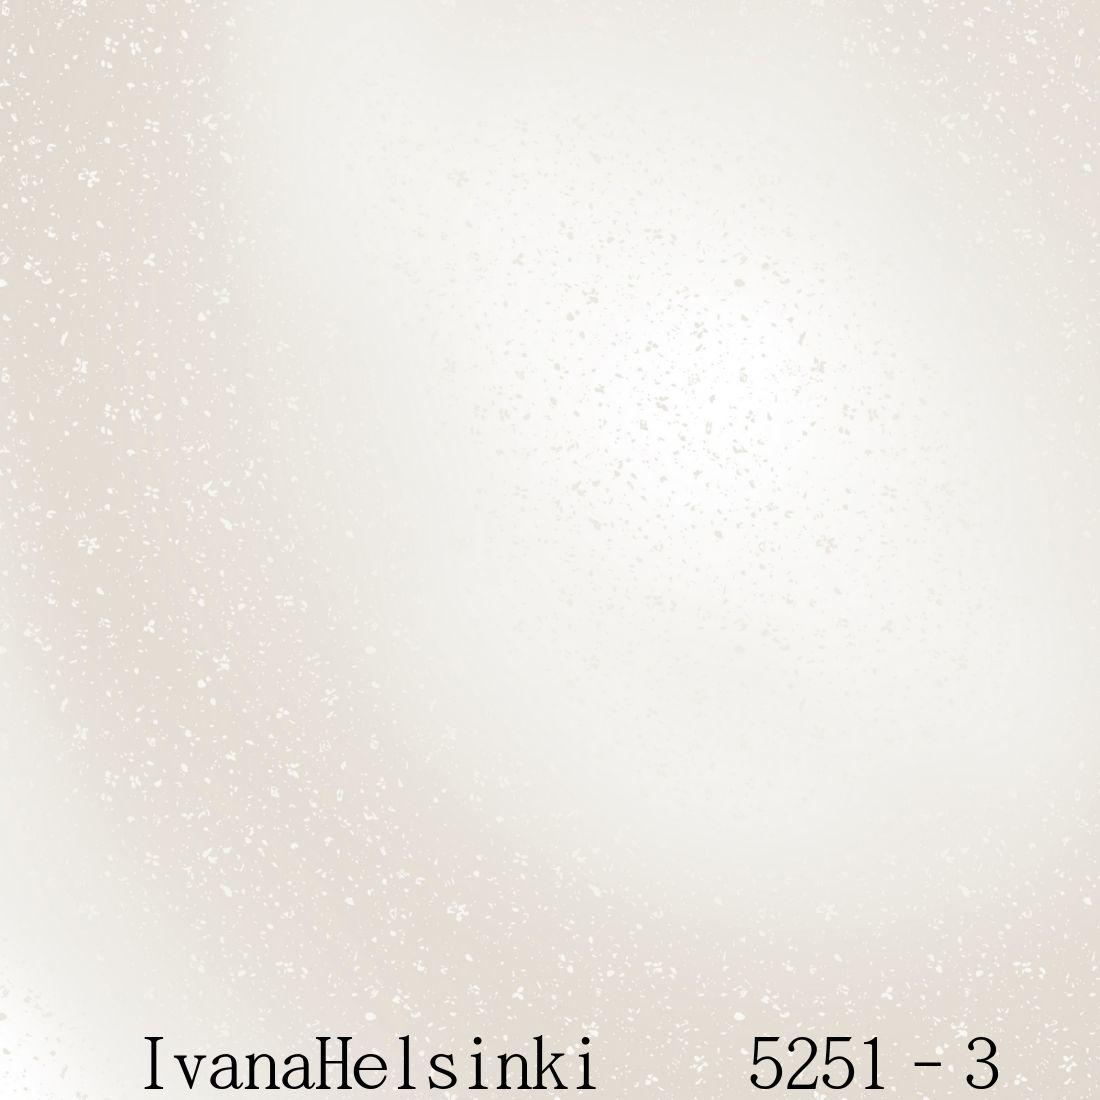 IvanaHelsinki イヴァナヘルシンキフィンランド製 壁紙5251-3【 53cm幅×10m巻 】裏面:フリース素材スプラッター柄 北欧 自然 ホワイト アイボリー輸入壁紙IvanaHelsinki Wallpaper★P10倍★